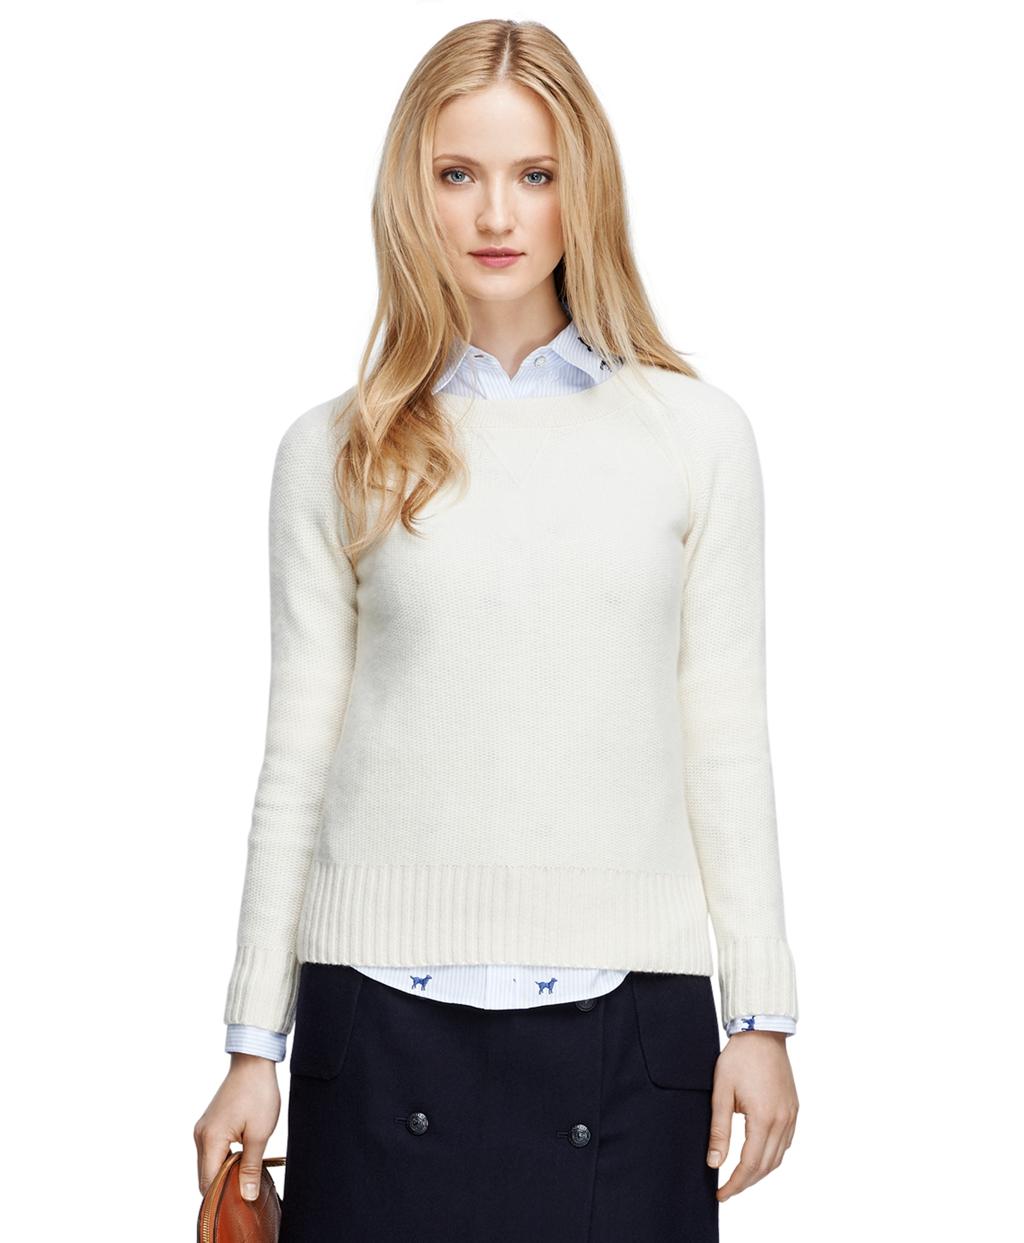 White Cashmere Cardigan Sweater